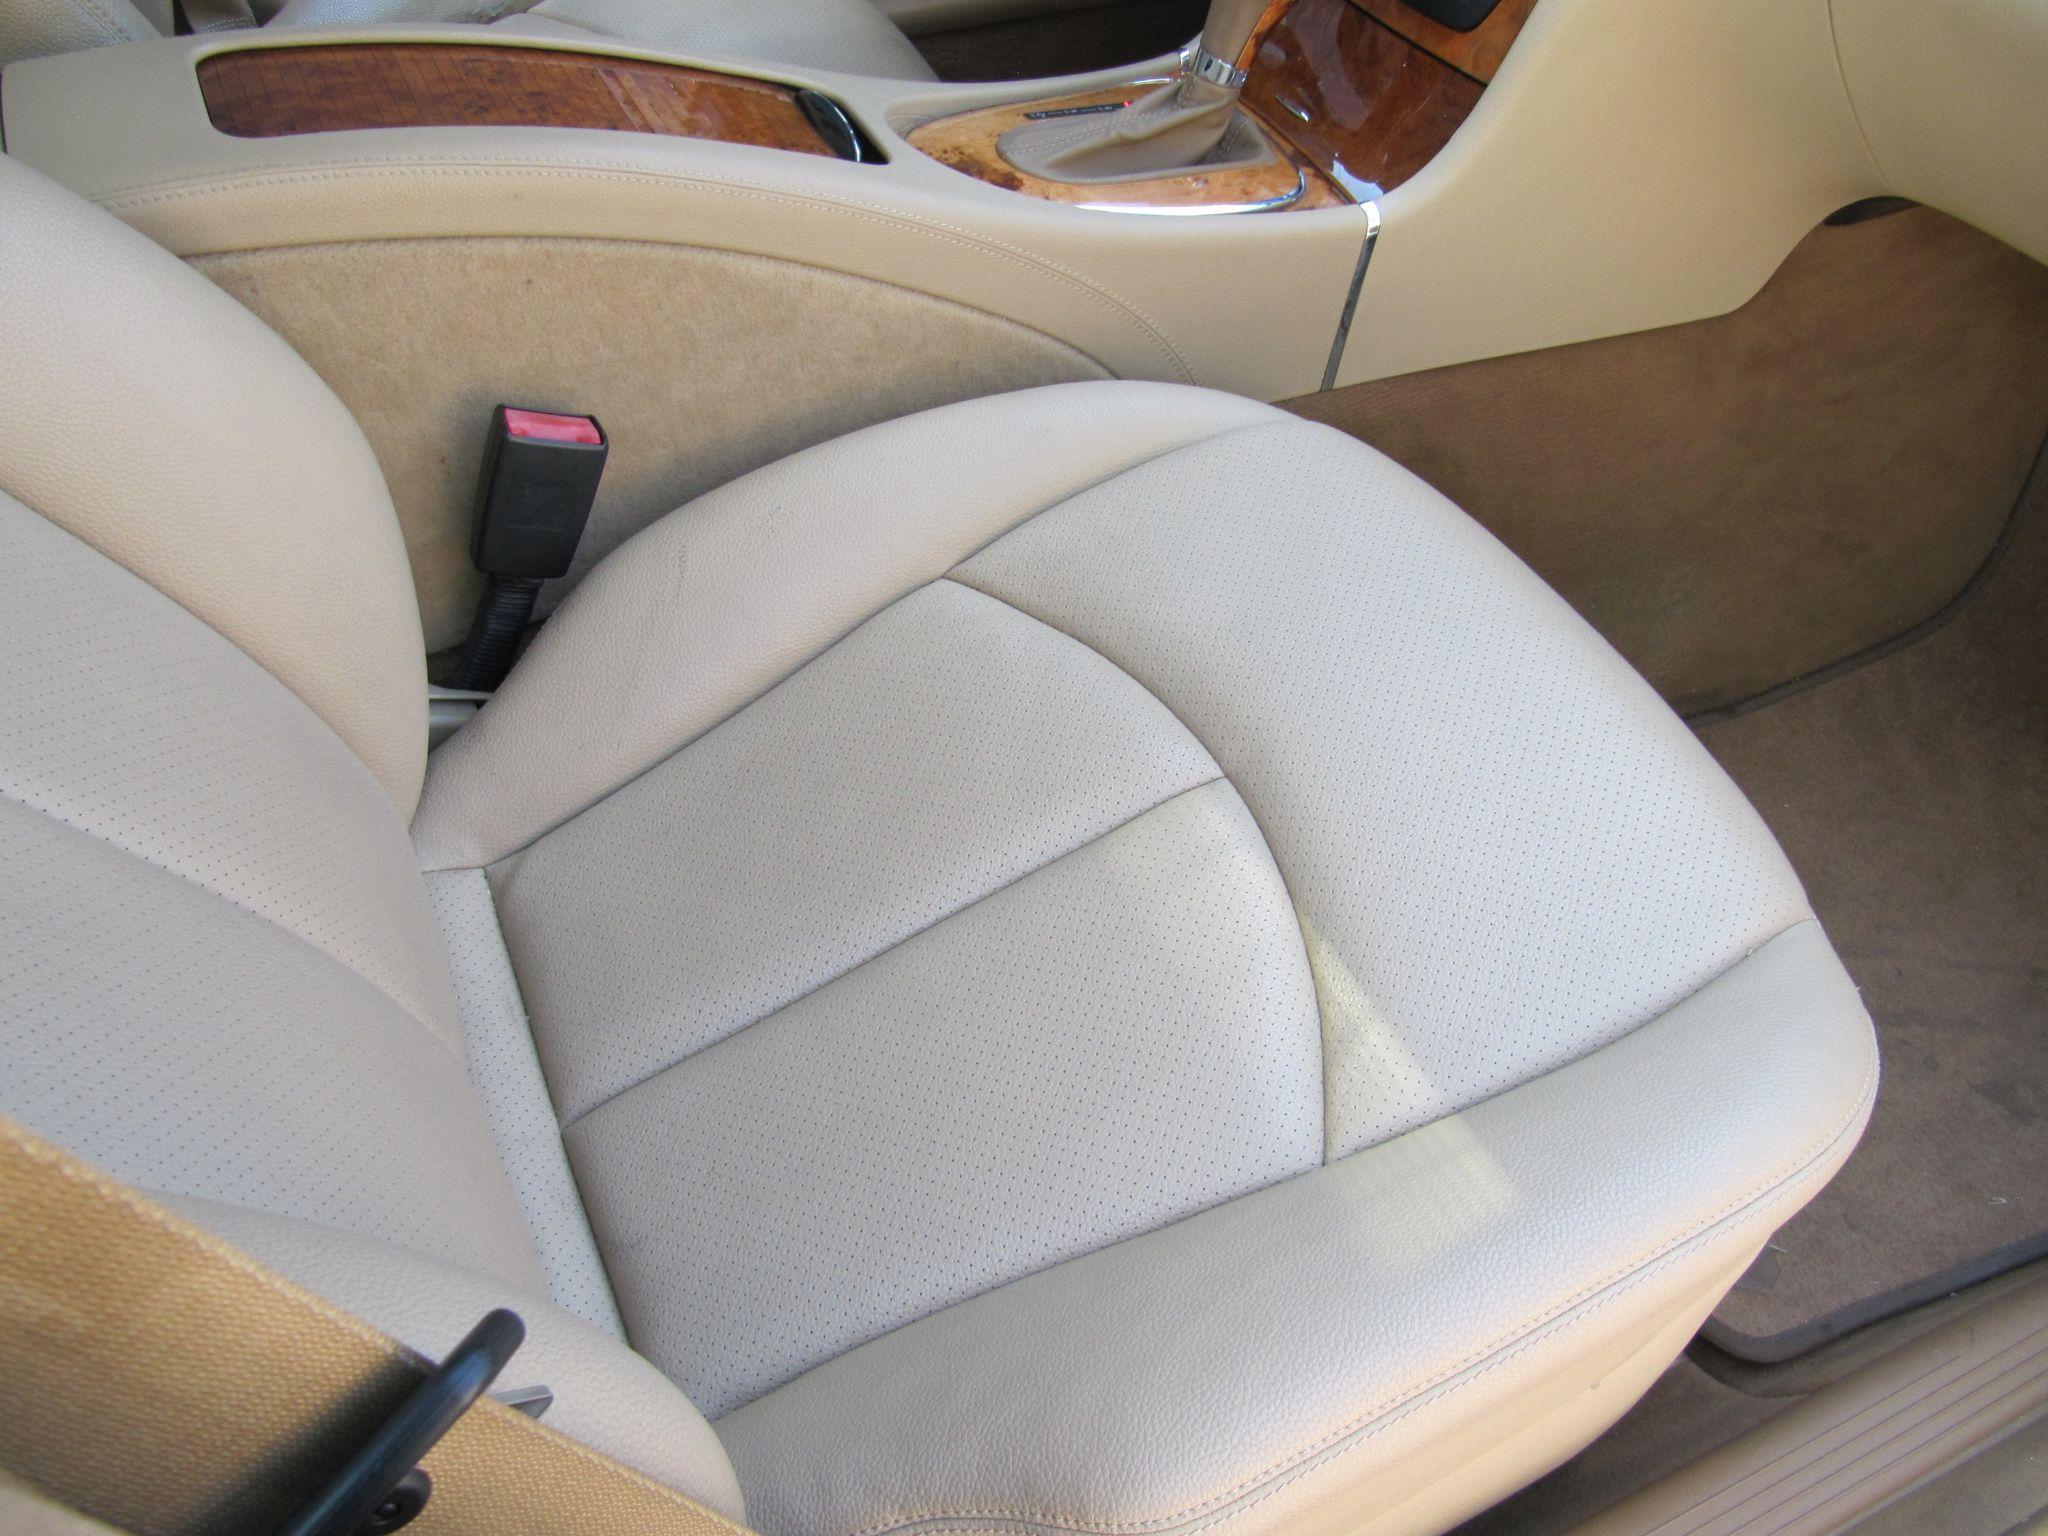 2008 MERCEDES BENZ E350 4MATIC 20